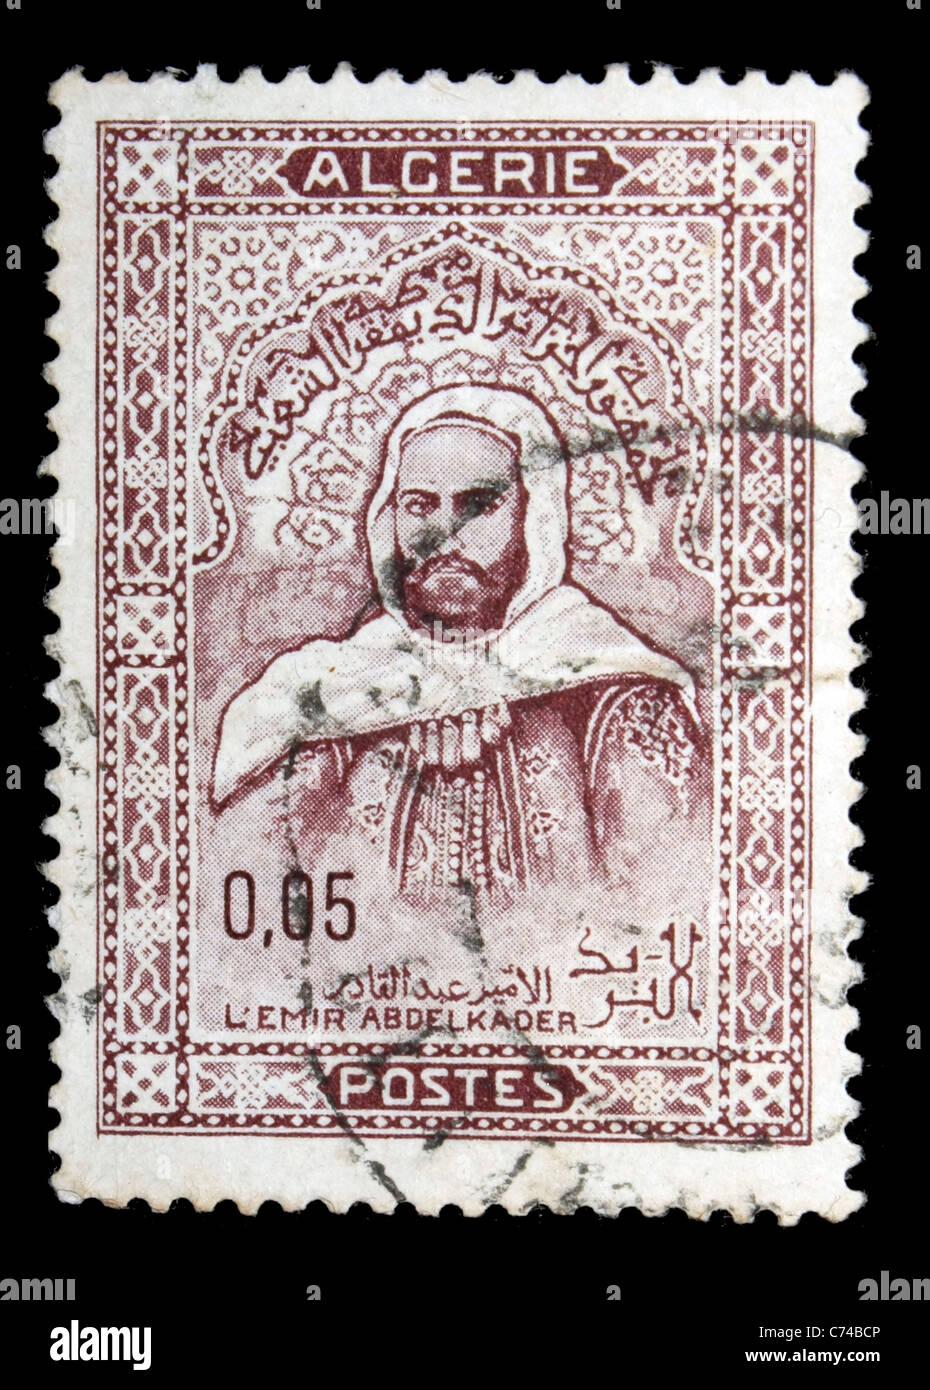 L'Emir Abdelkader Algeria francobollo Immagini Stock